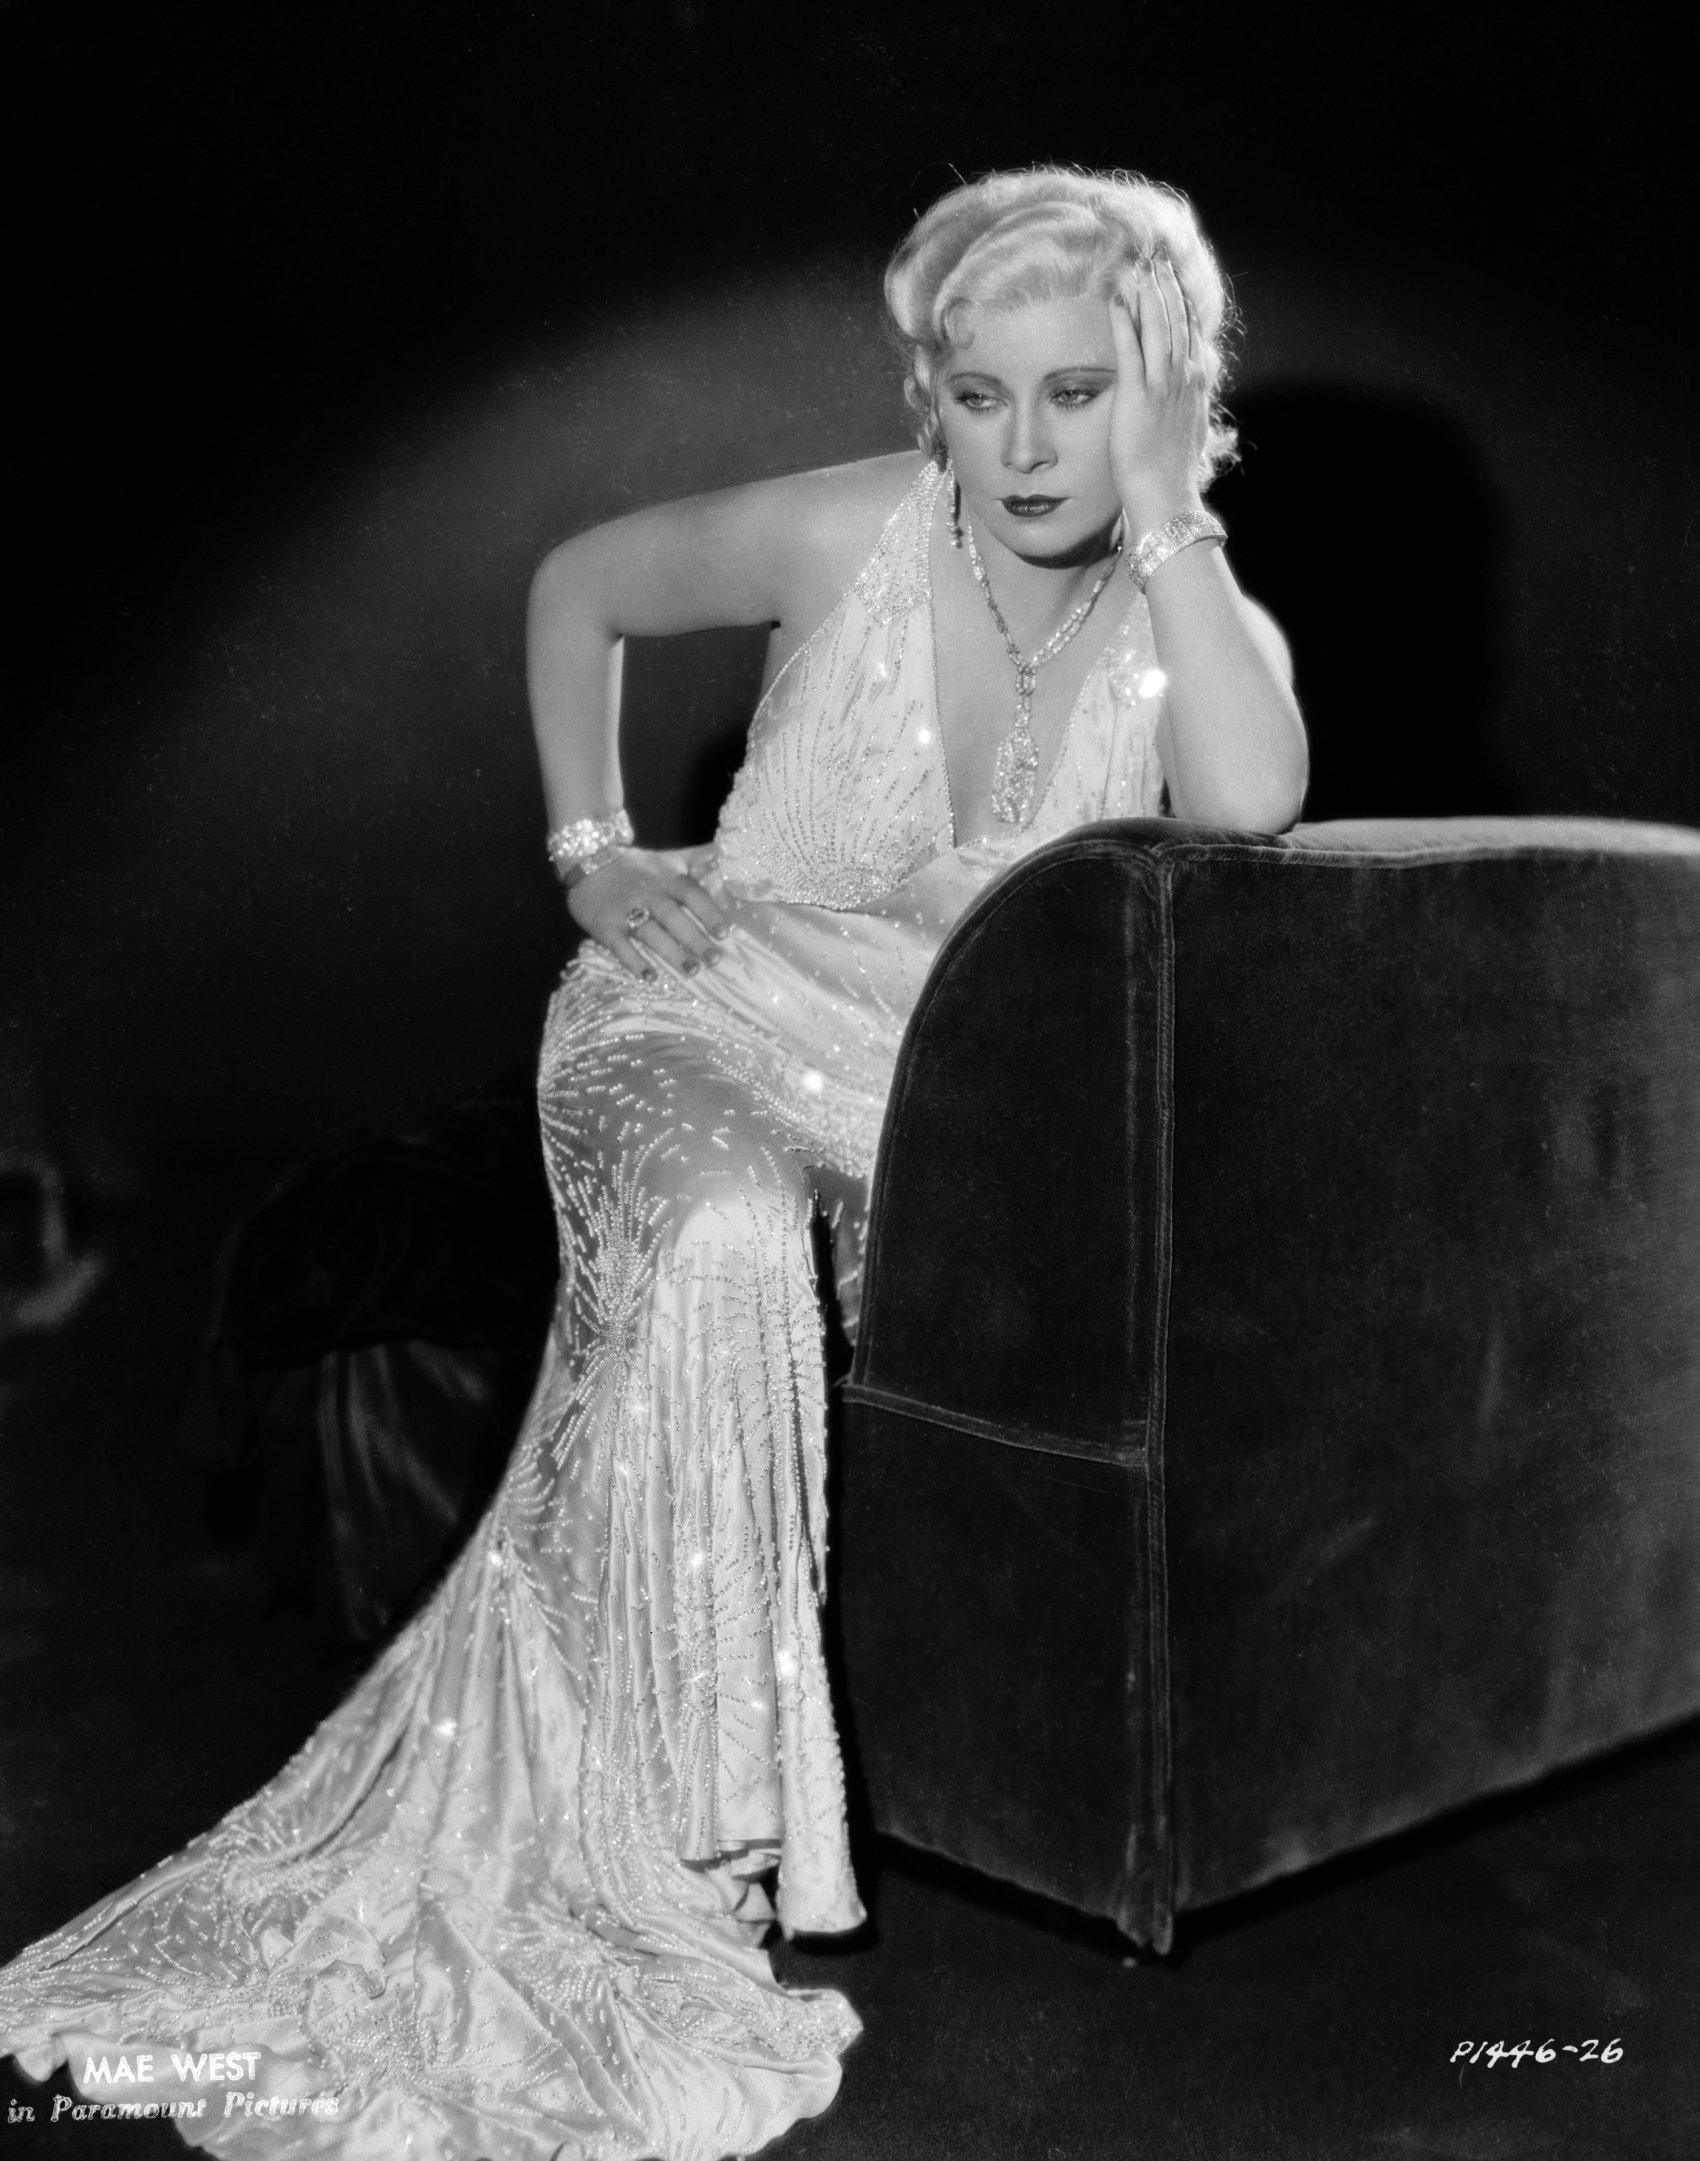 Styling 54B Mae West inspired shoot on Pinterest | Mae West, Google and Gemma Ward